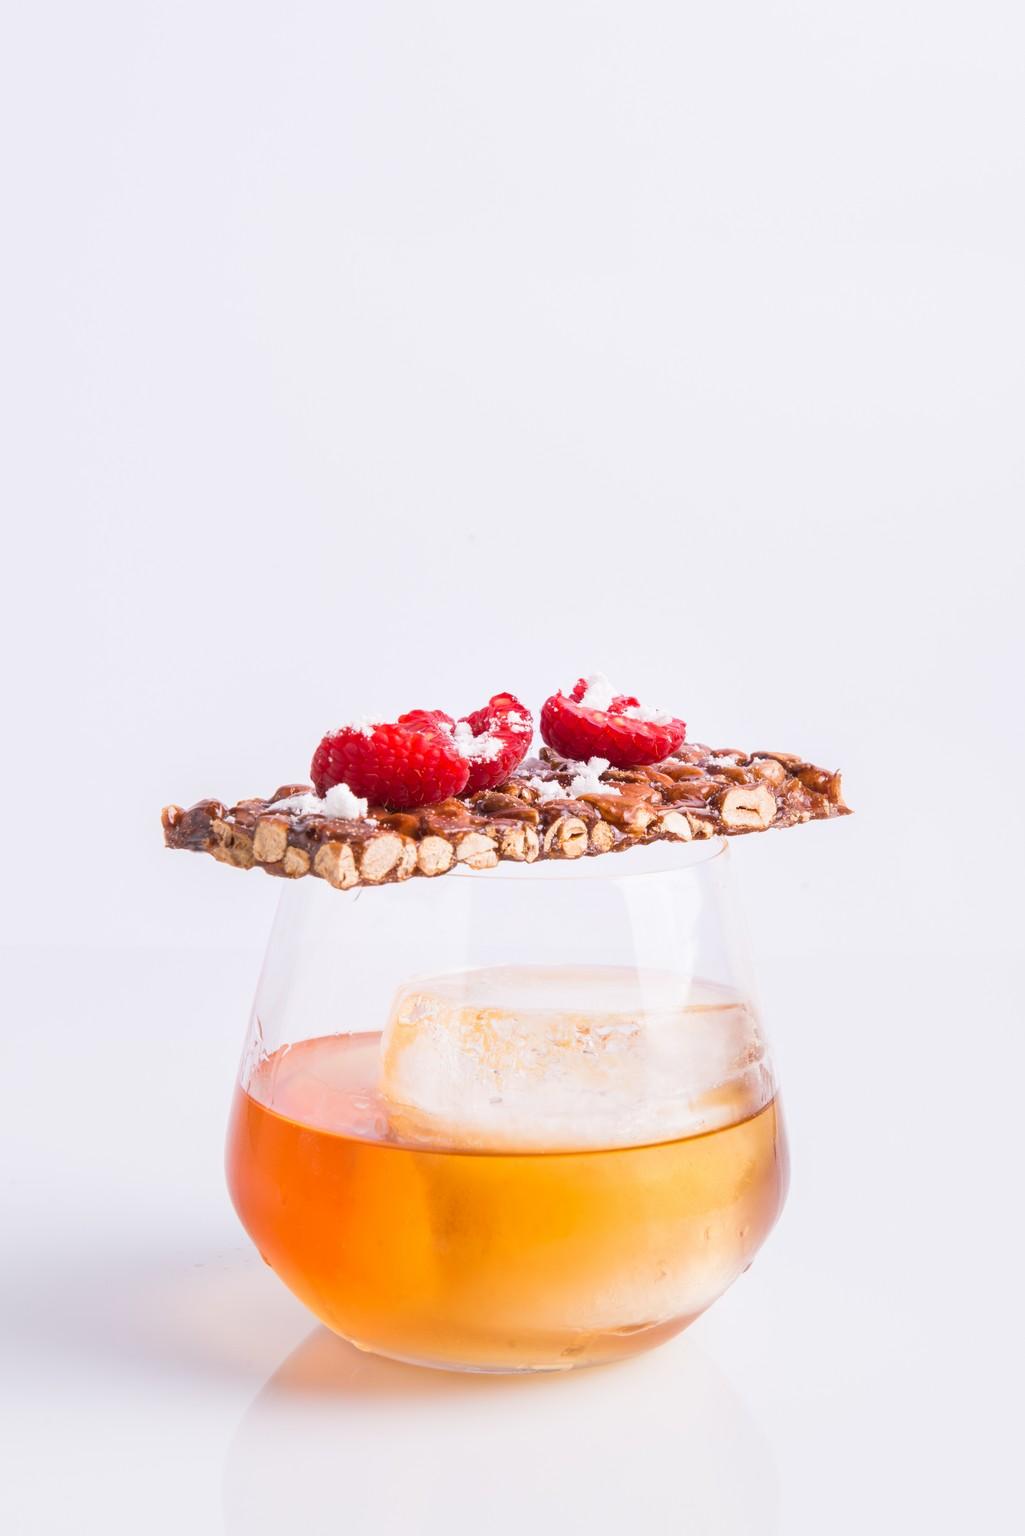 Flavia_Fiengo_Food_E_Beverage_00038